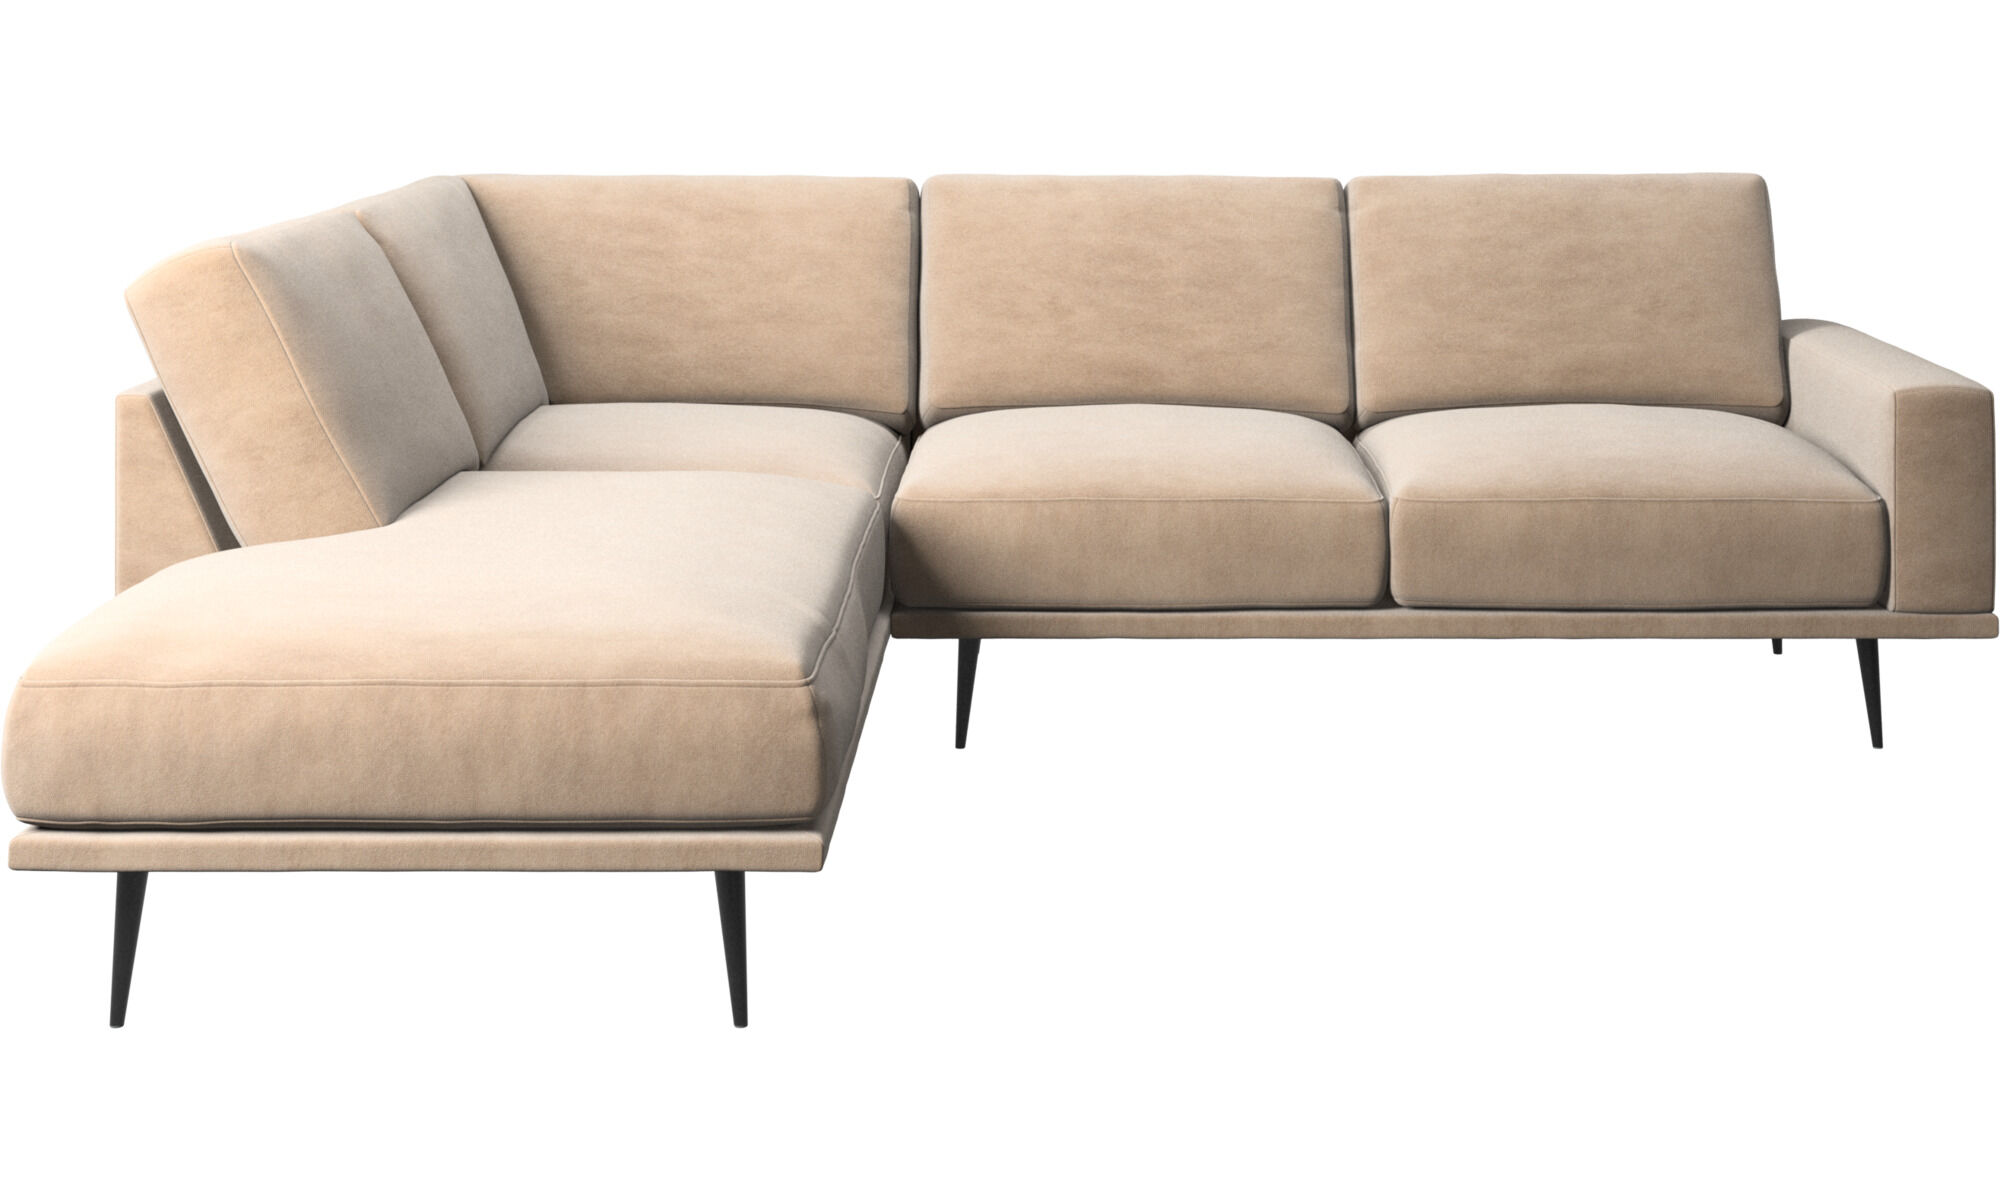 Exklusive designer lounge sofas boconcept